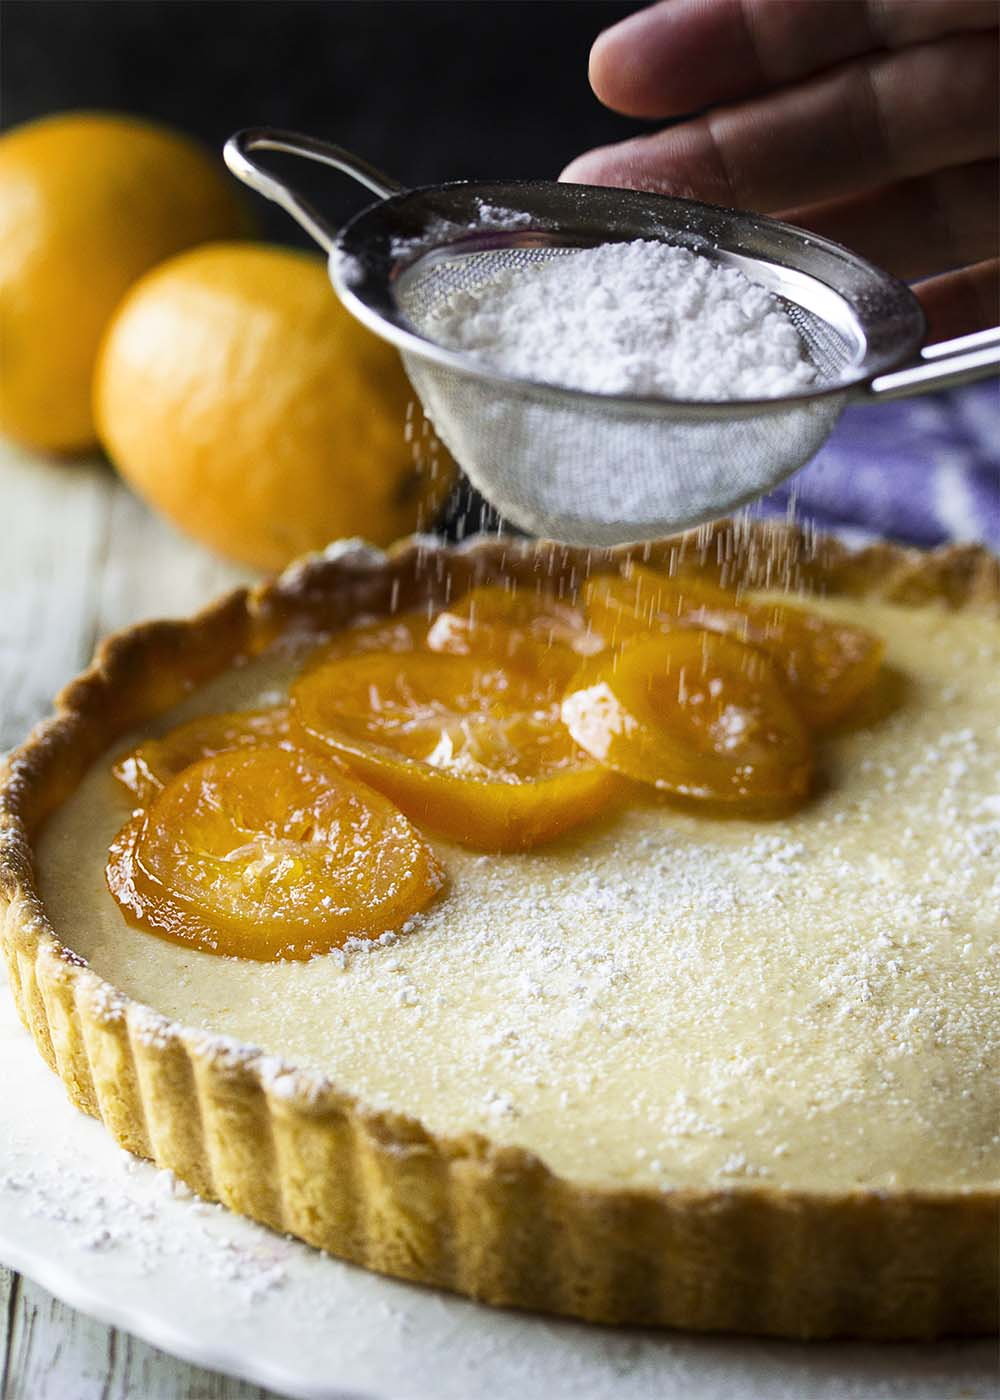 A hand shaking powdered sugar onto the top of an Italian lemon ricotta pie.